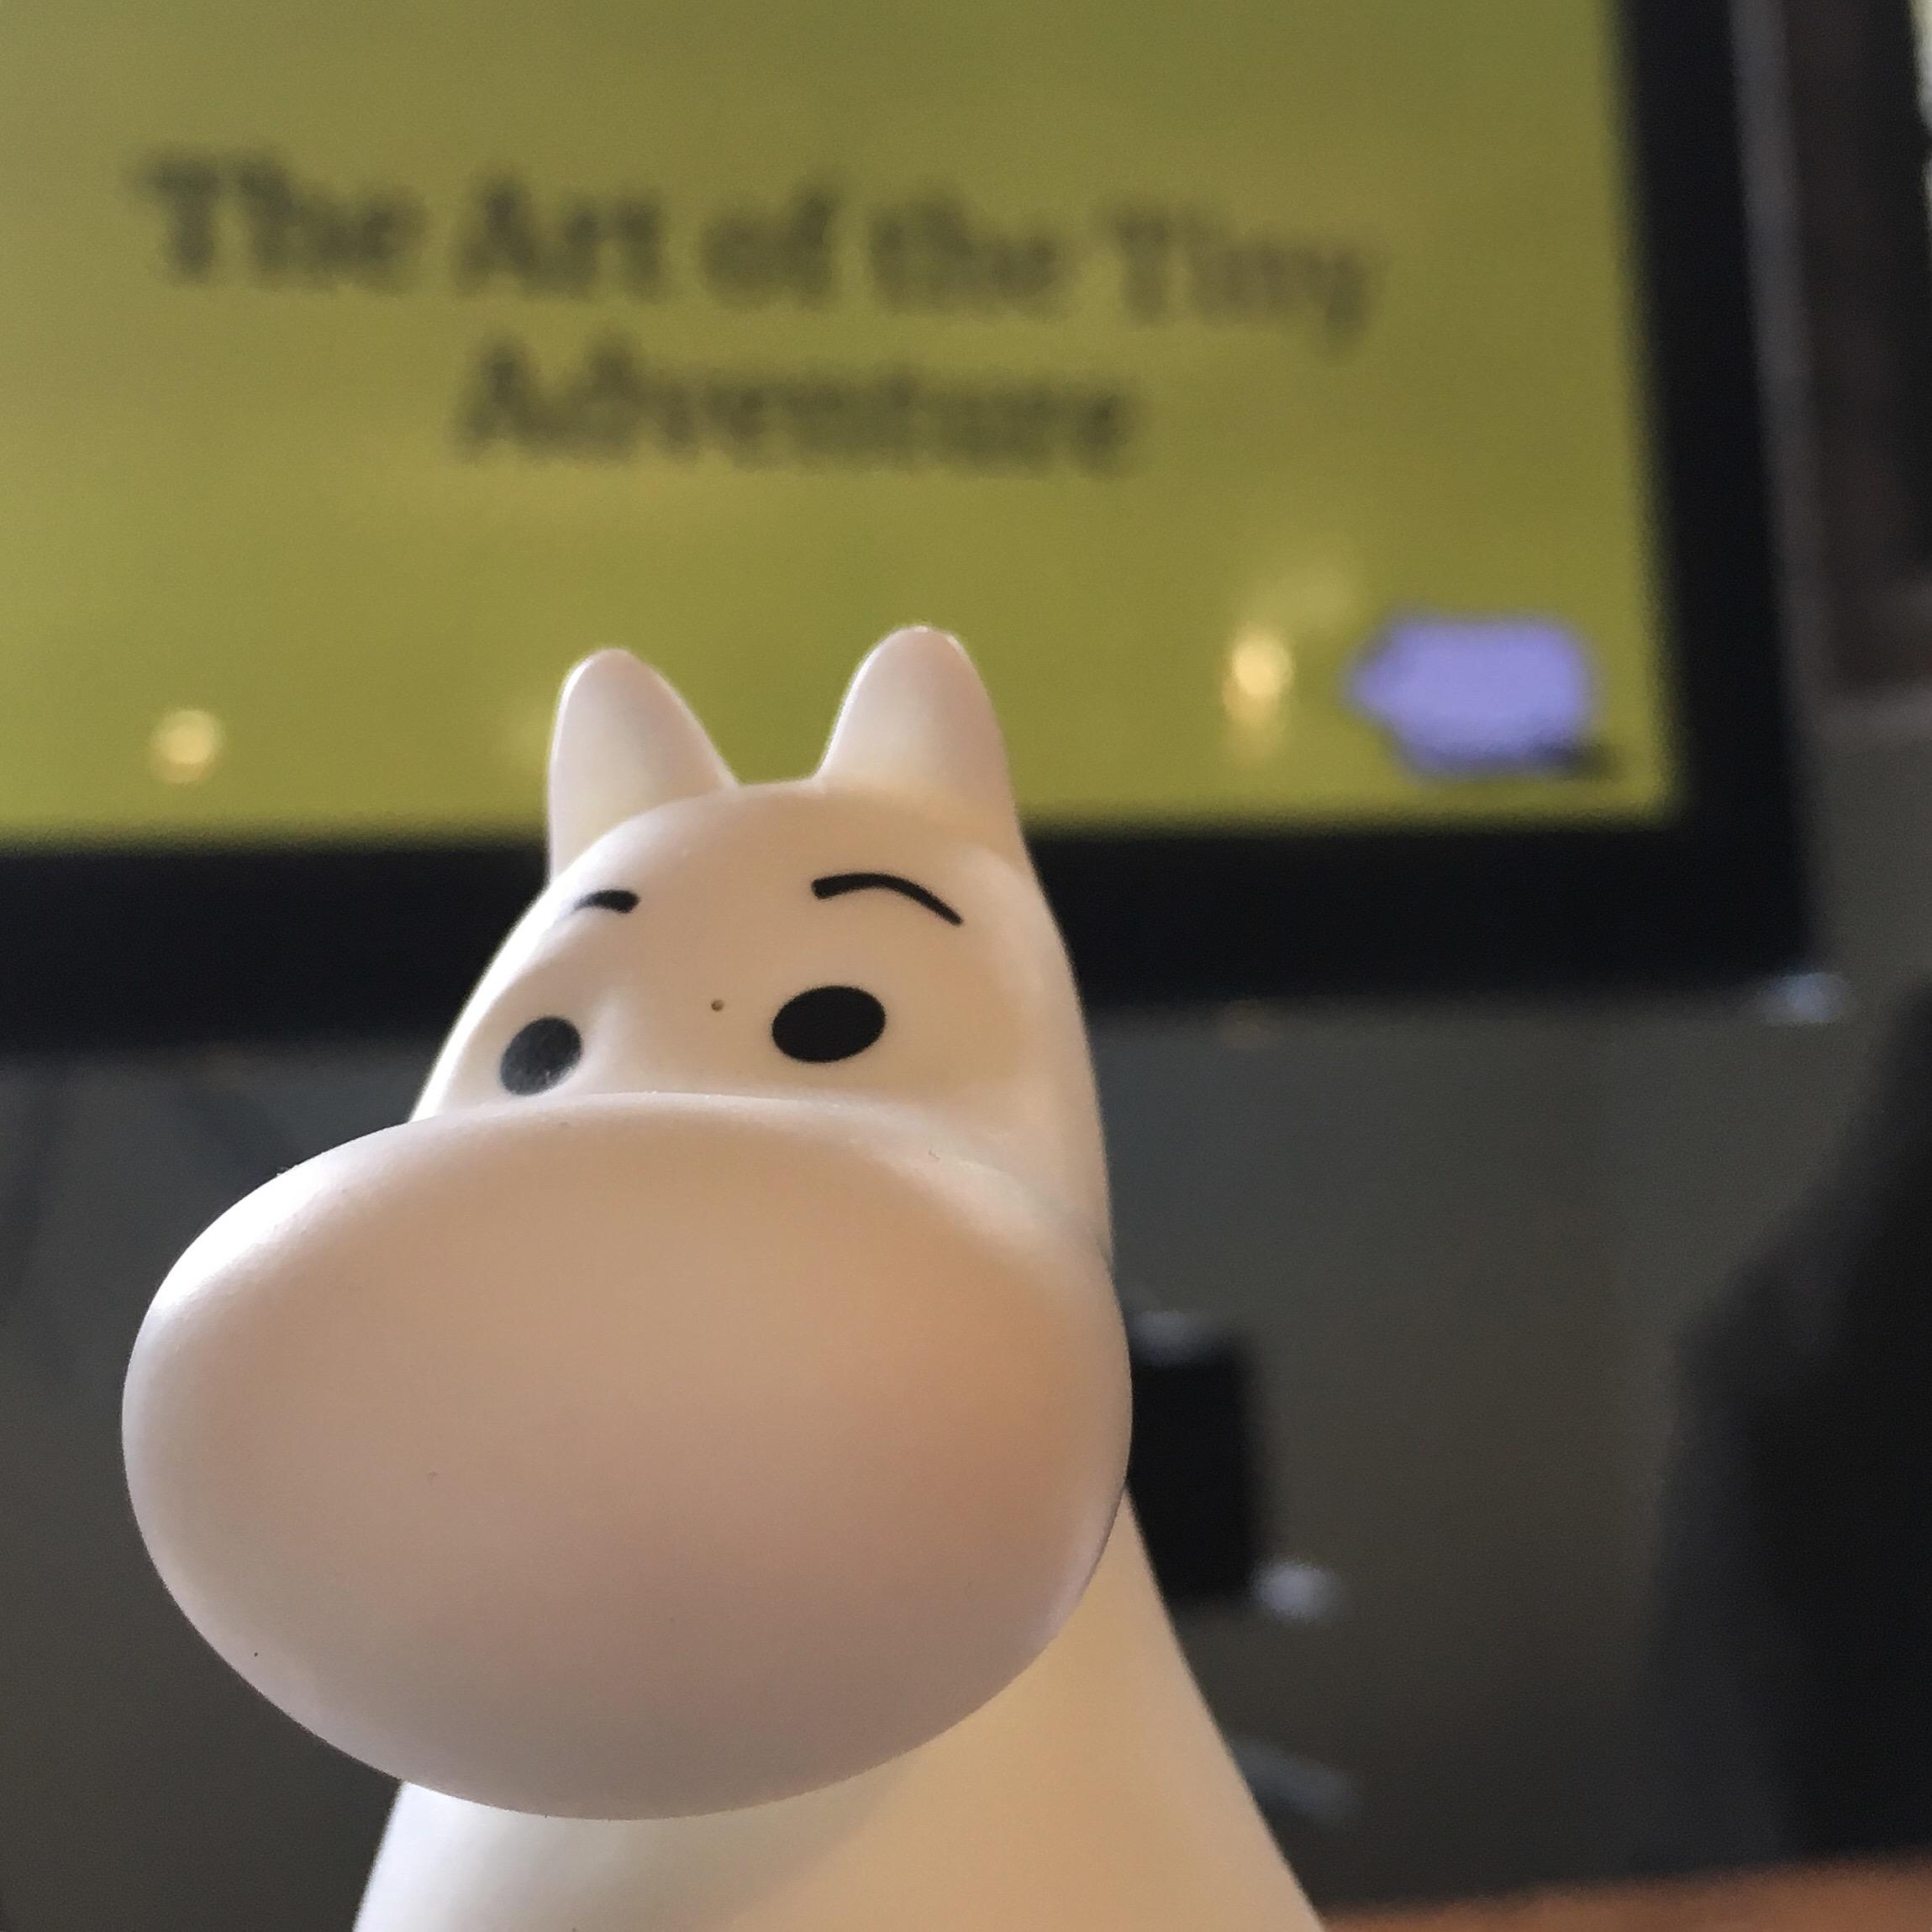 The Art of the Tiny Adventure